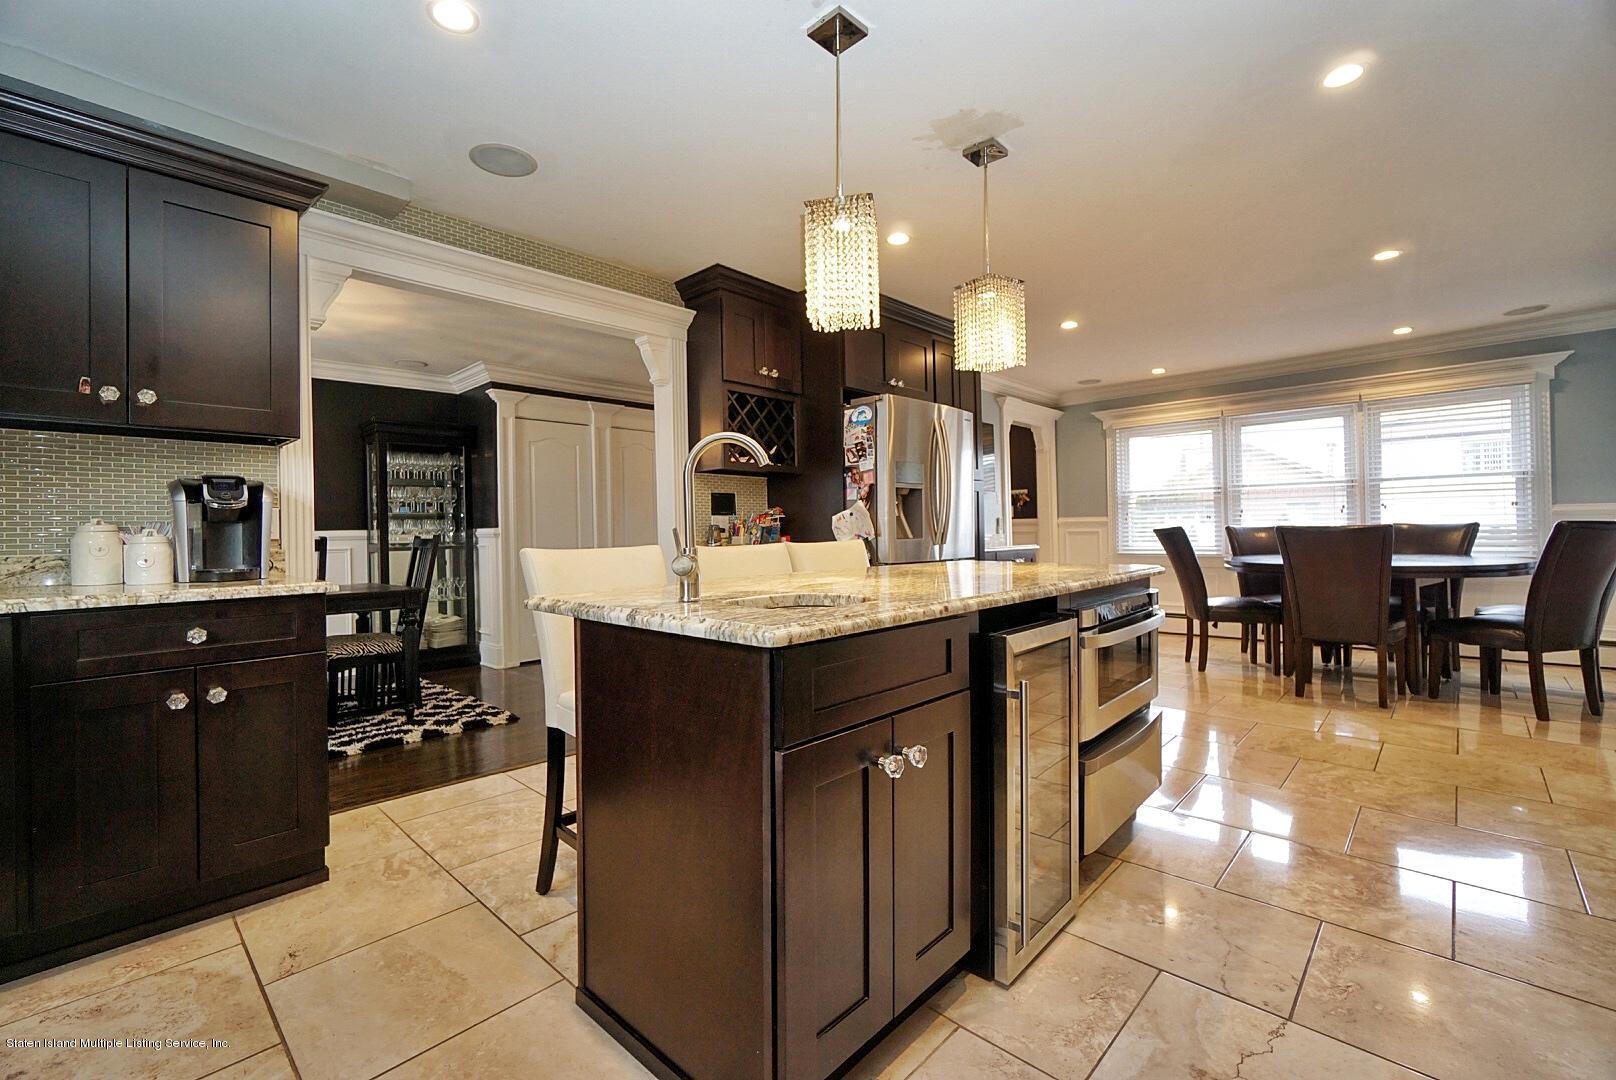 Single Family - Detached 590 Arden Avenue  Staten Island, NY 10312, MLS-1125410-5